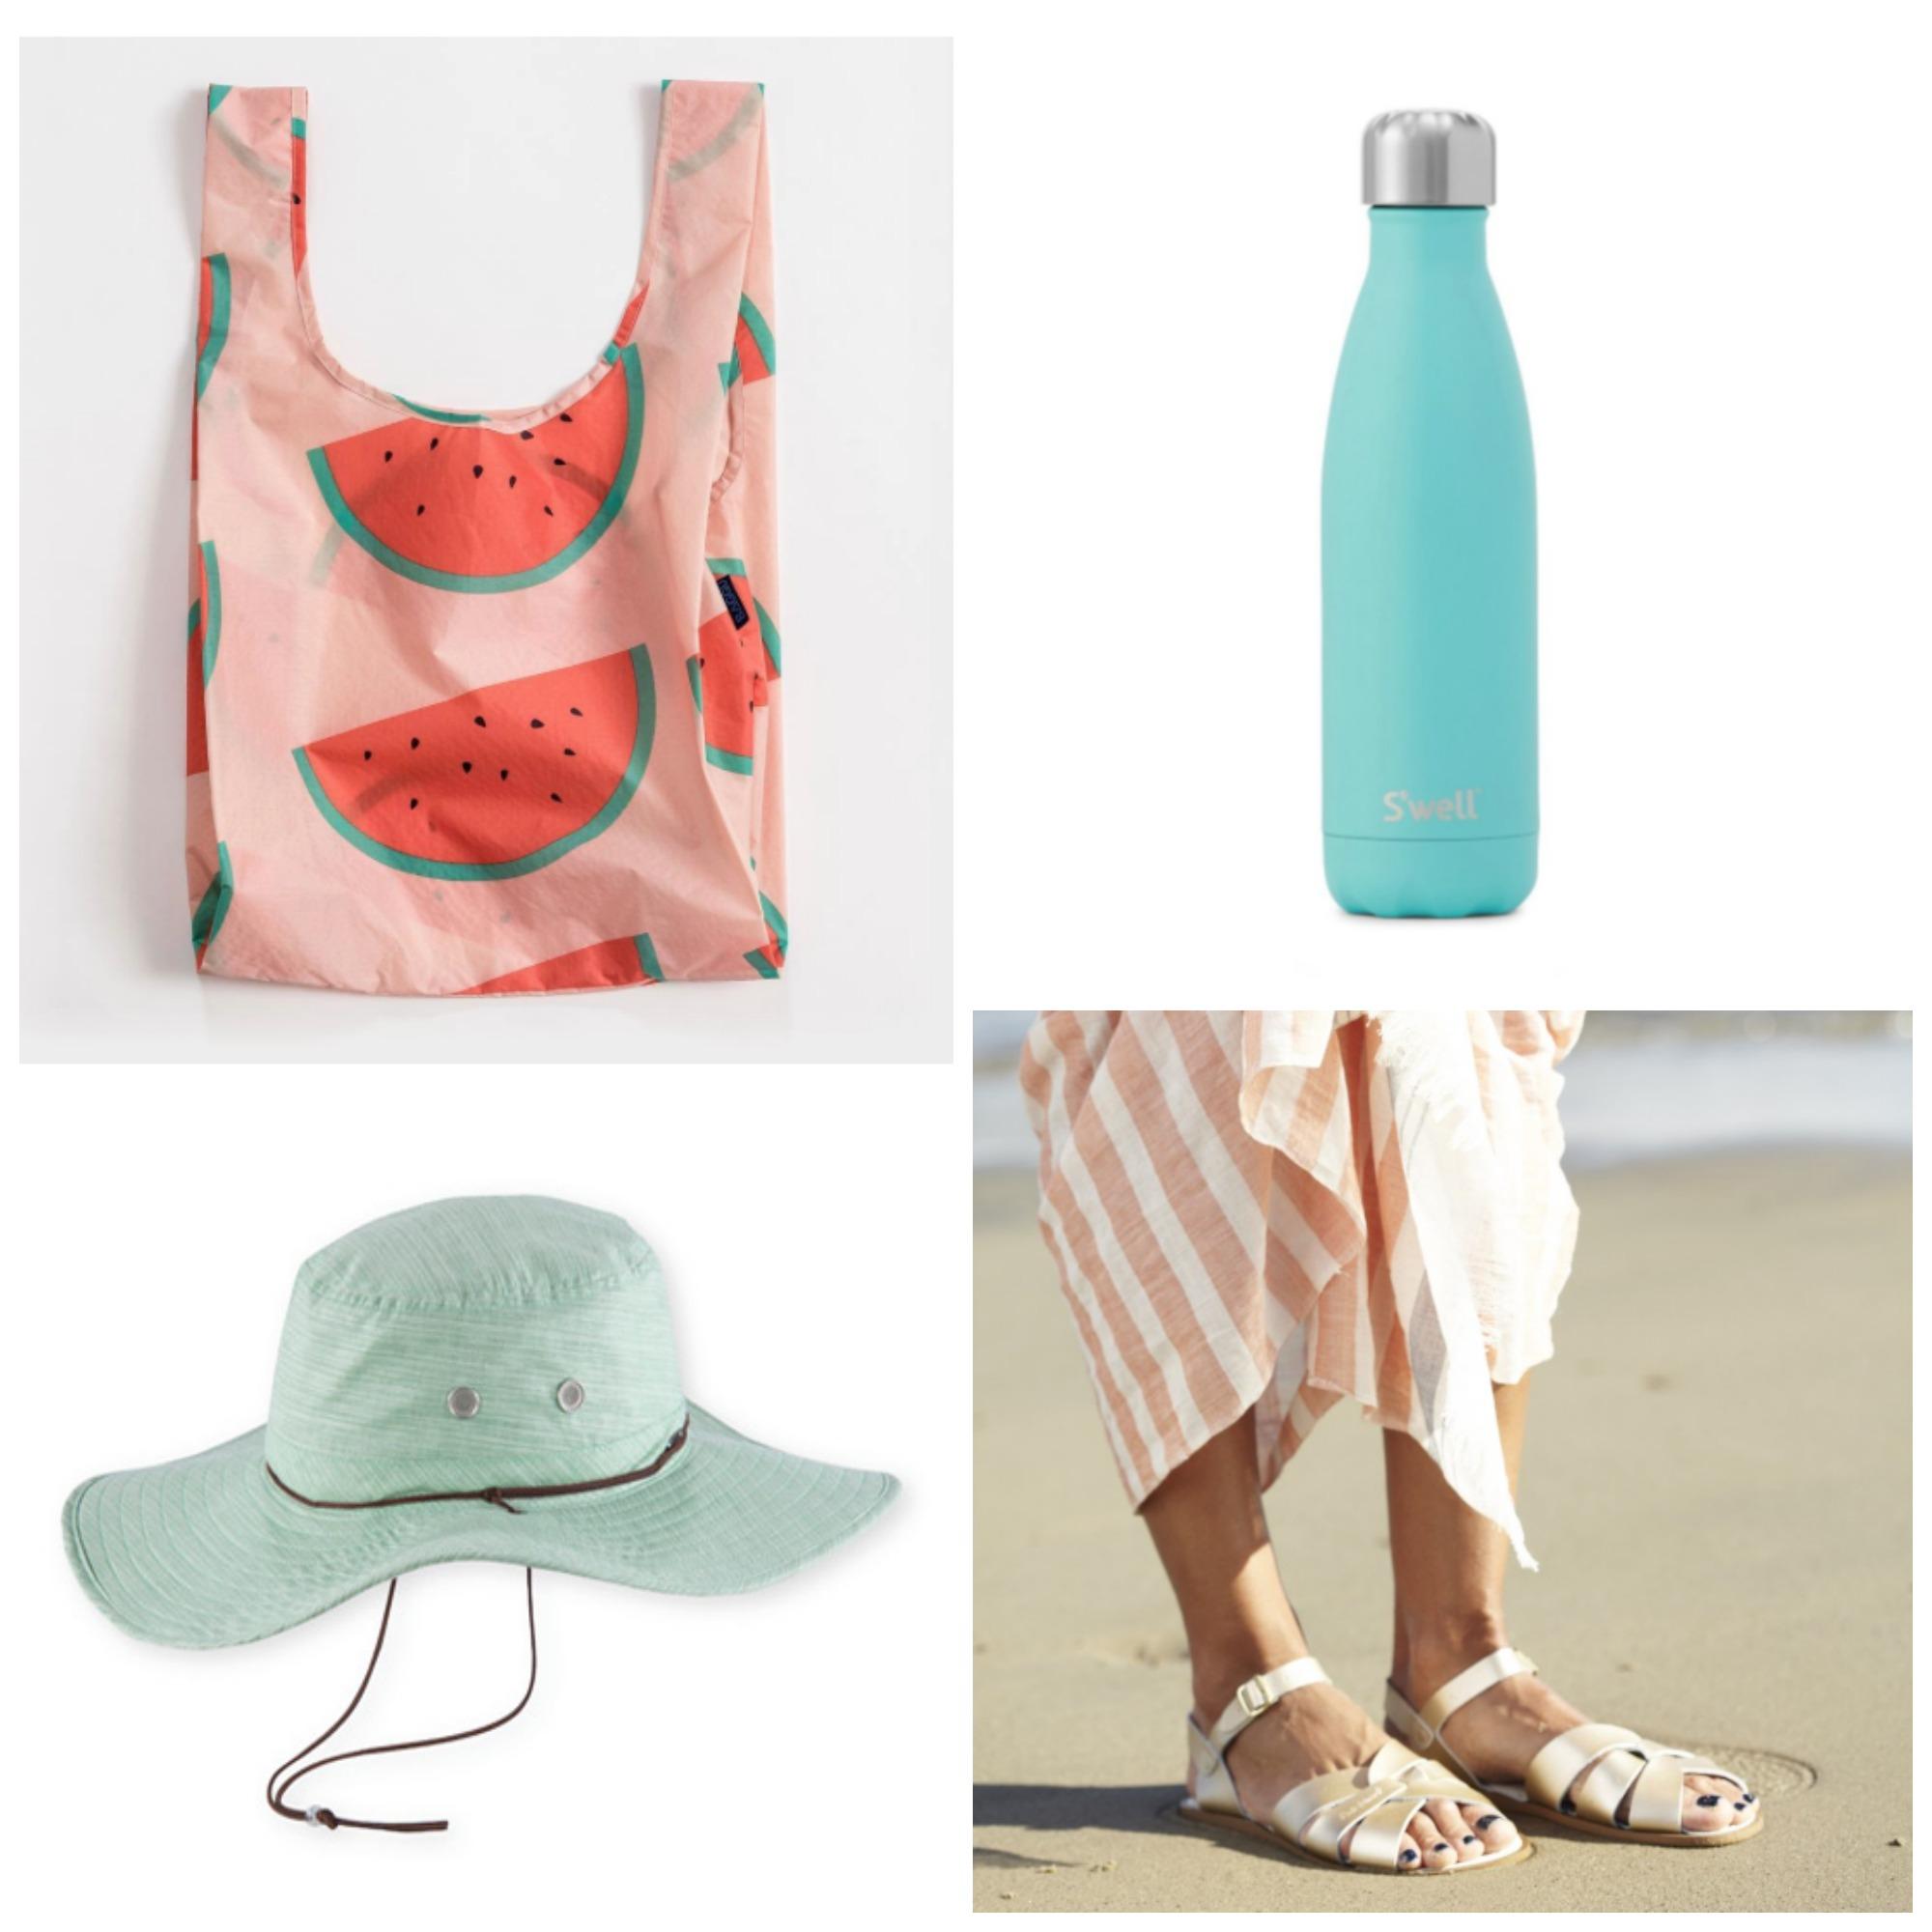 Baggu shopper, S'well bottle, Pistil 'Cricket' sunhat, Saltwater sandals